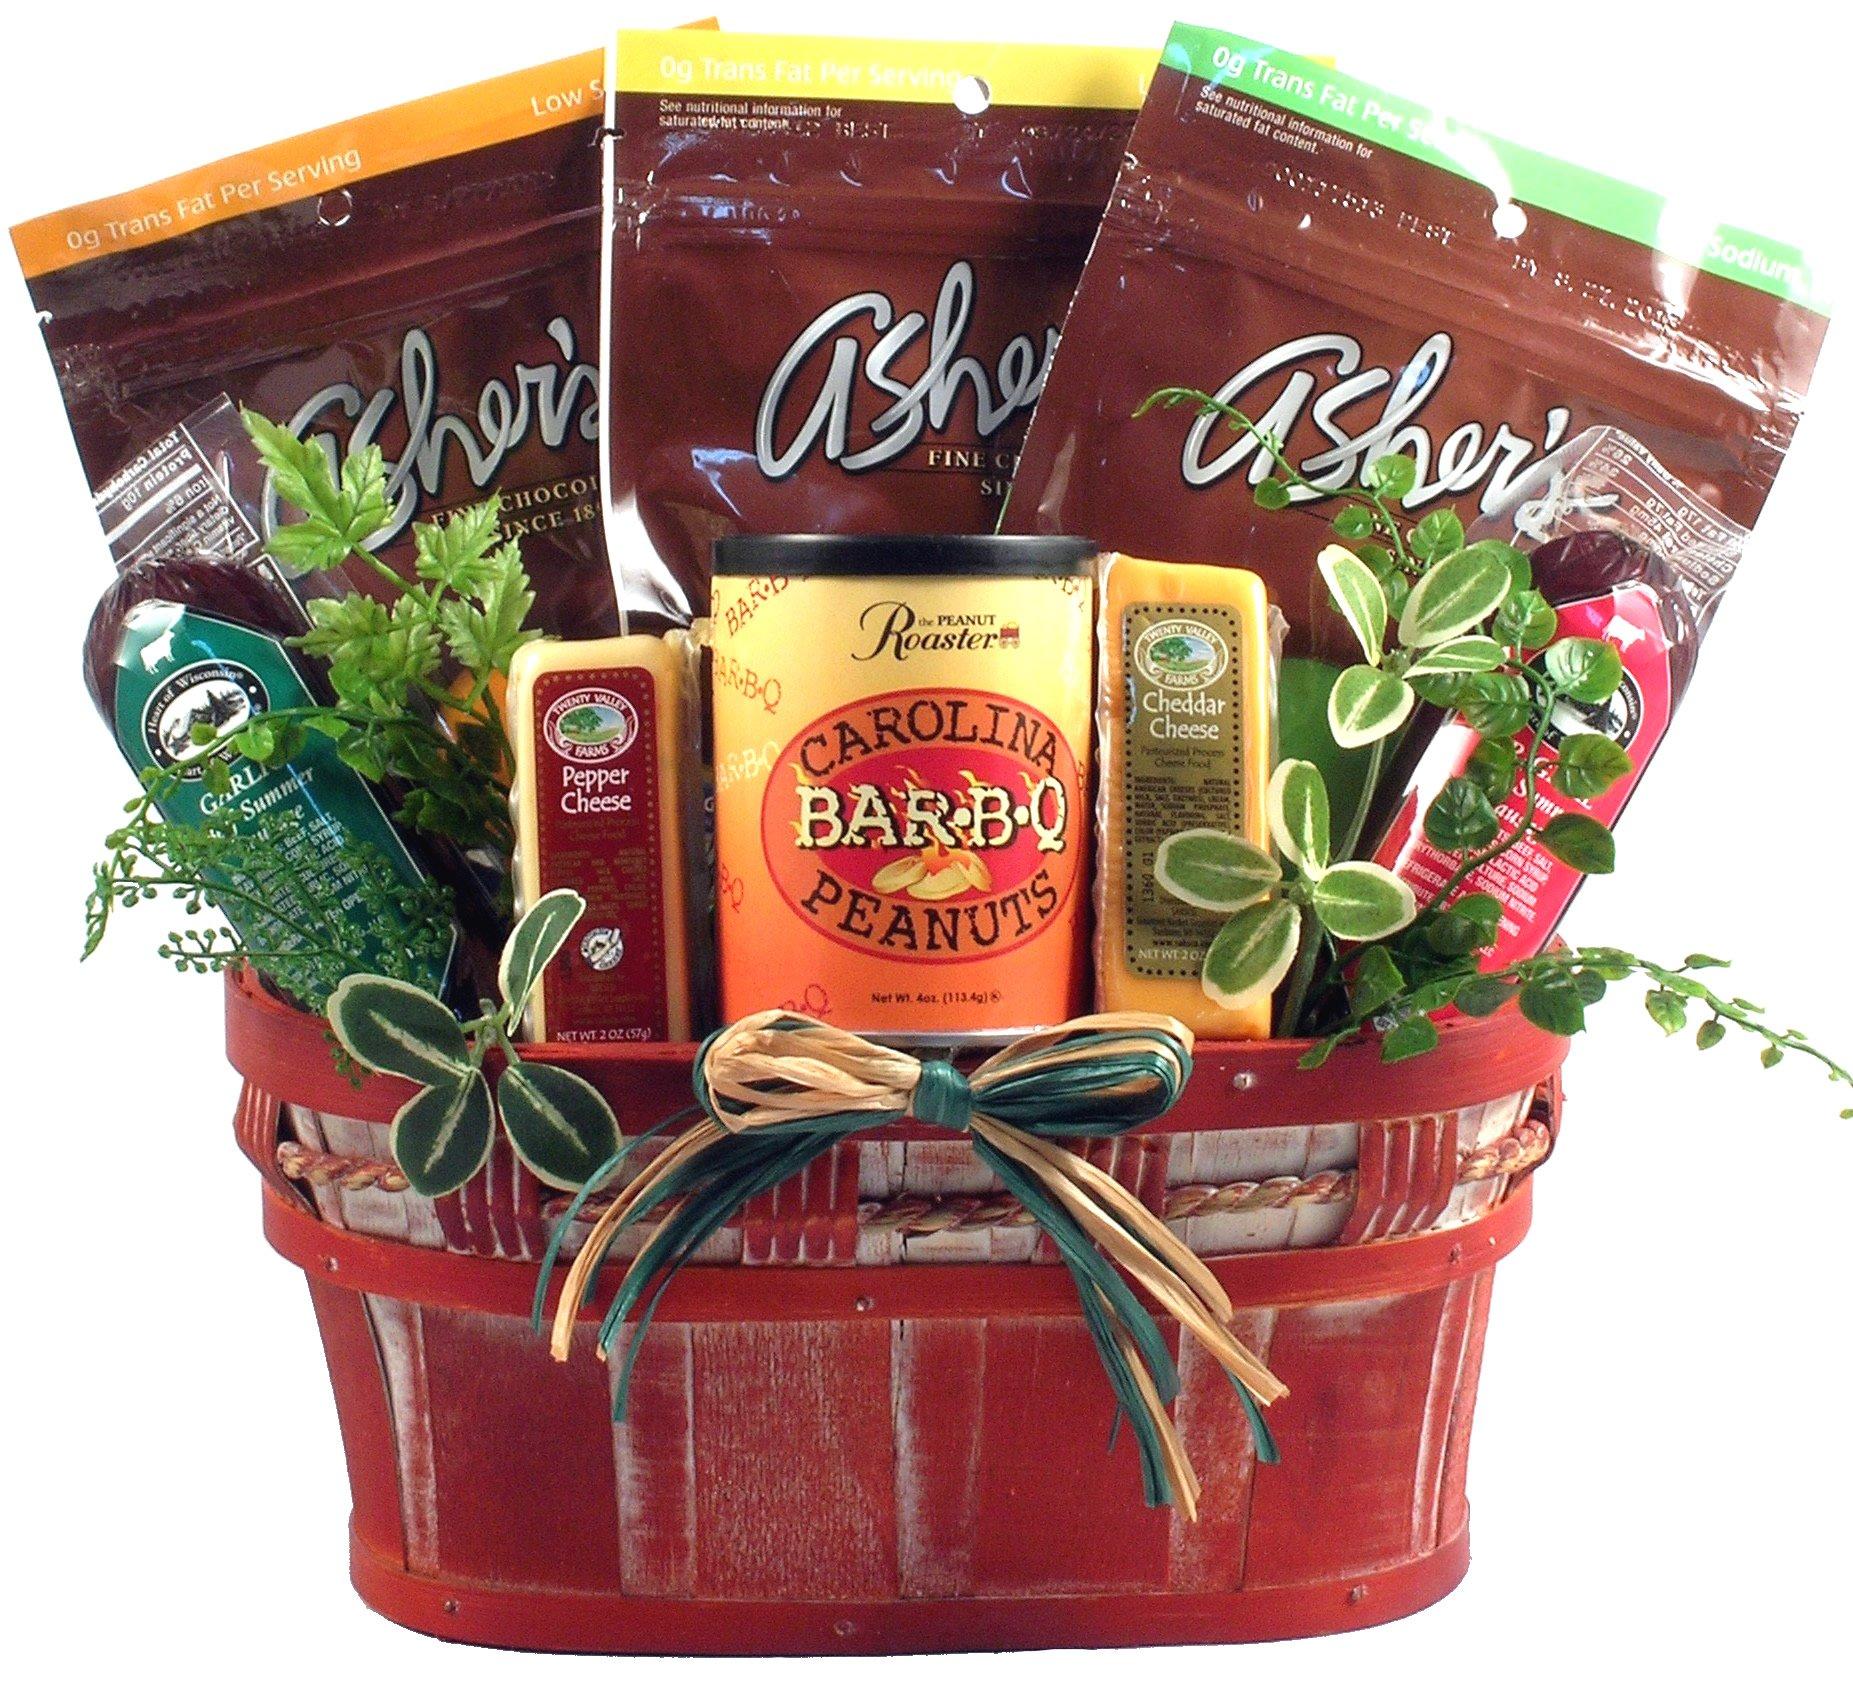 Gift Basket Village Healthy Living Sugar Free Gift Basket, 6 Pound by Gift Basket Village